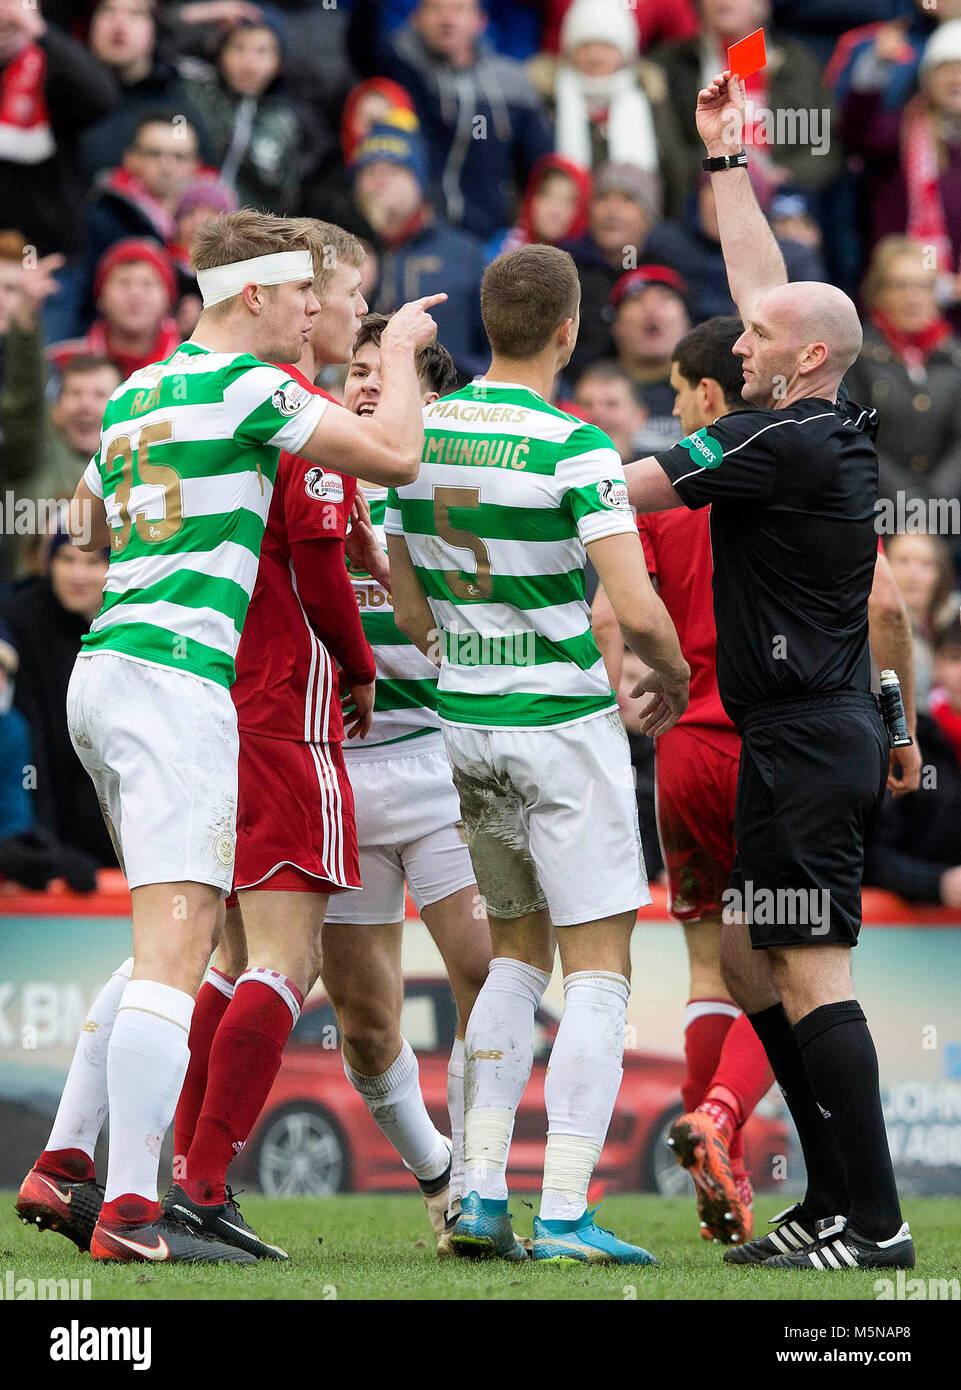 Aberdeen's Sam Cosgrove is sent off during the Scottish Premiership match at Pittodrie Stadium, Abderdeen. - Stock Image